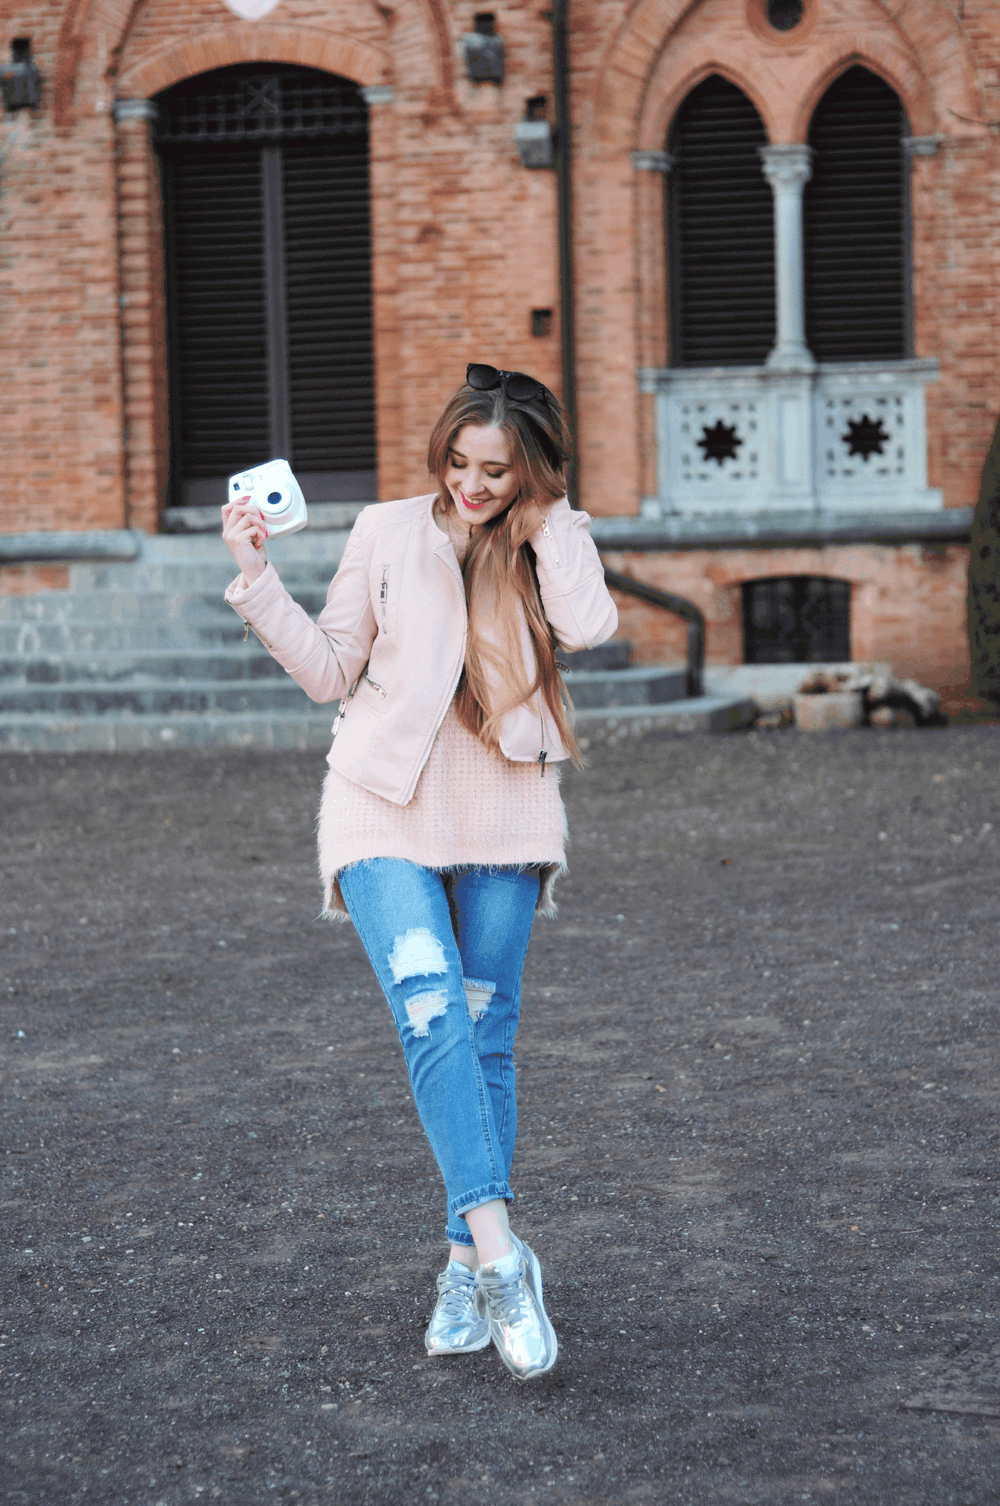 oots srebrne sneakersy różowy sweterek sheinside